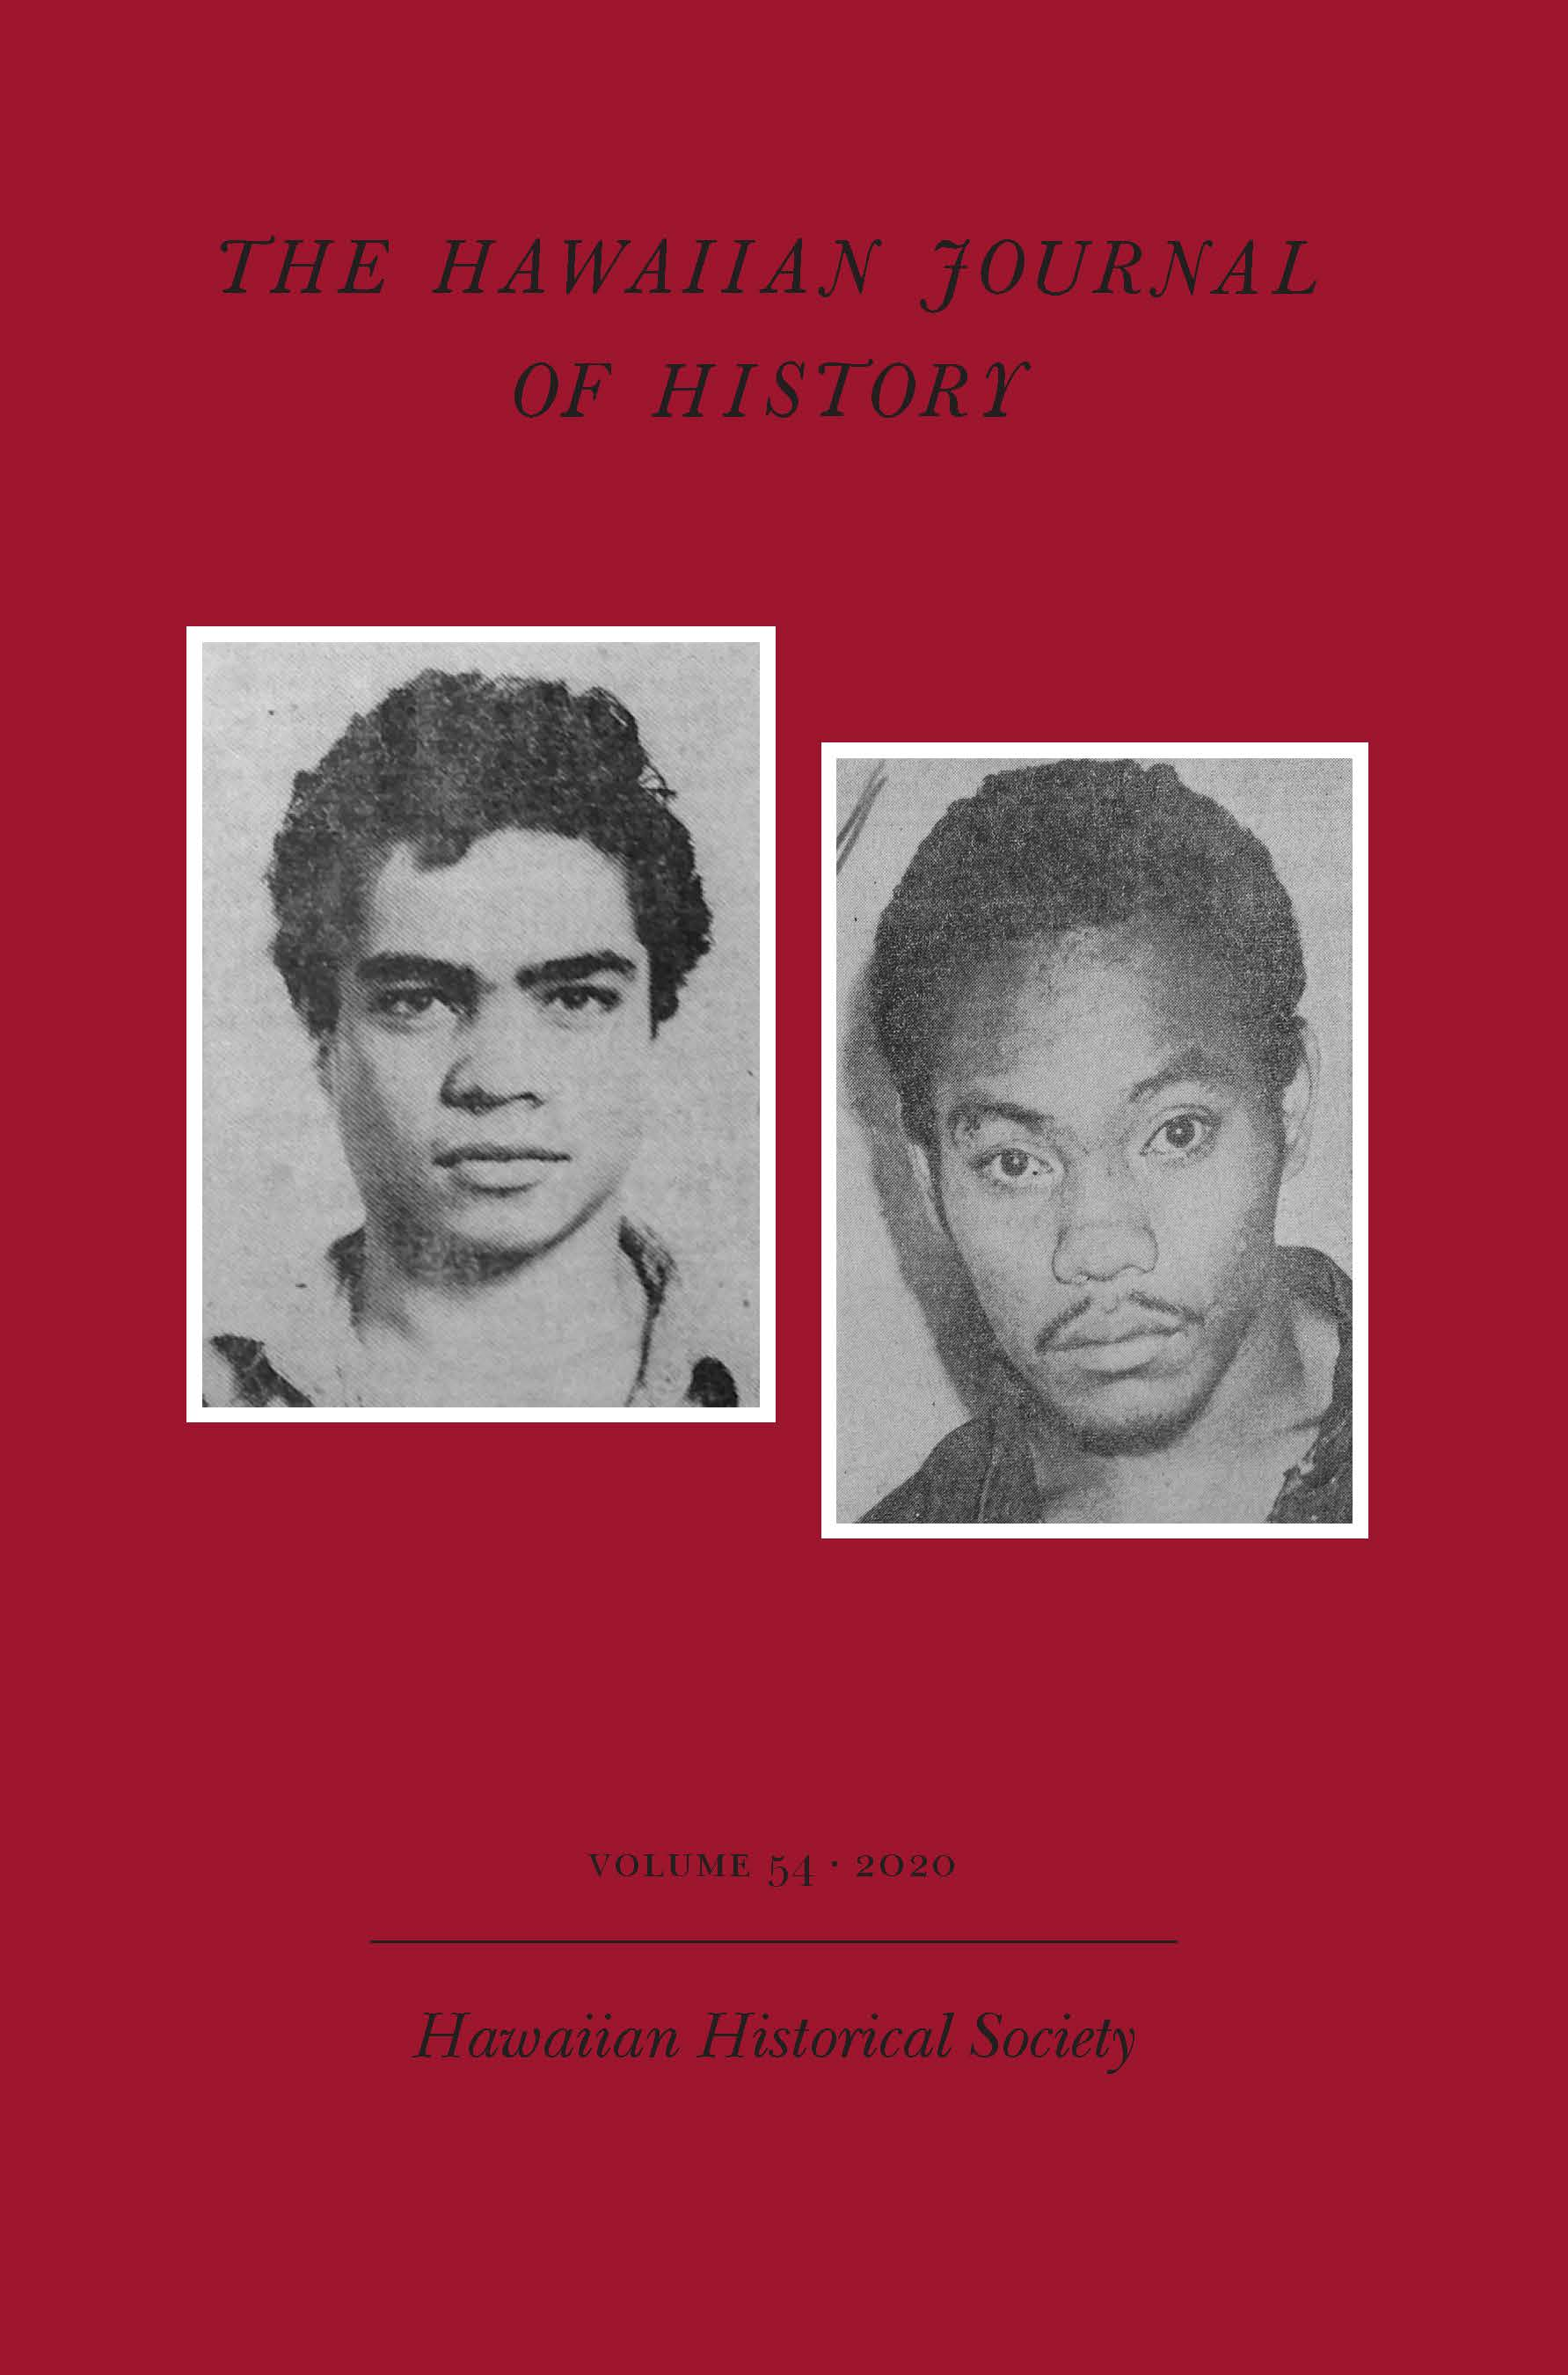 Hawaiian Journal of History: Volume 54, 2020